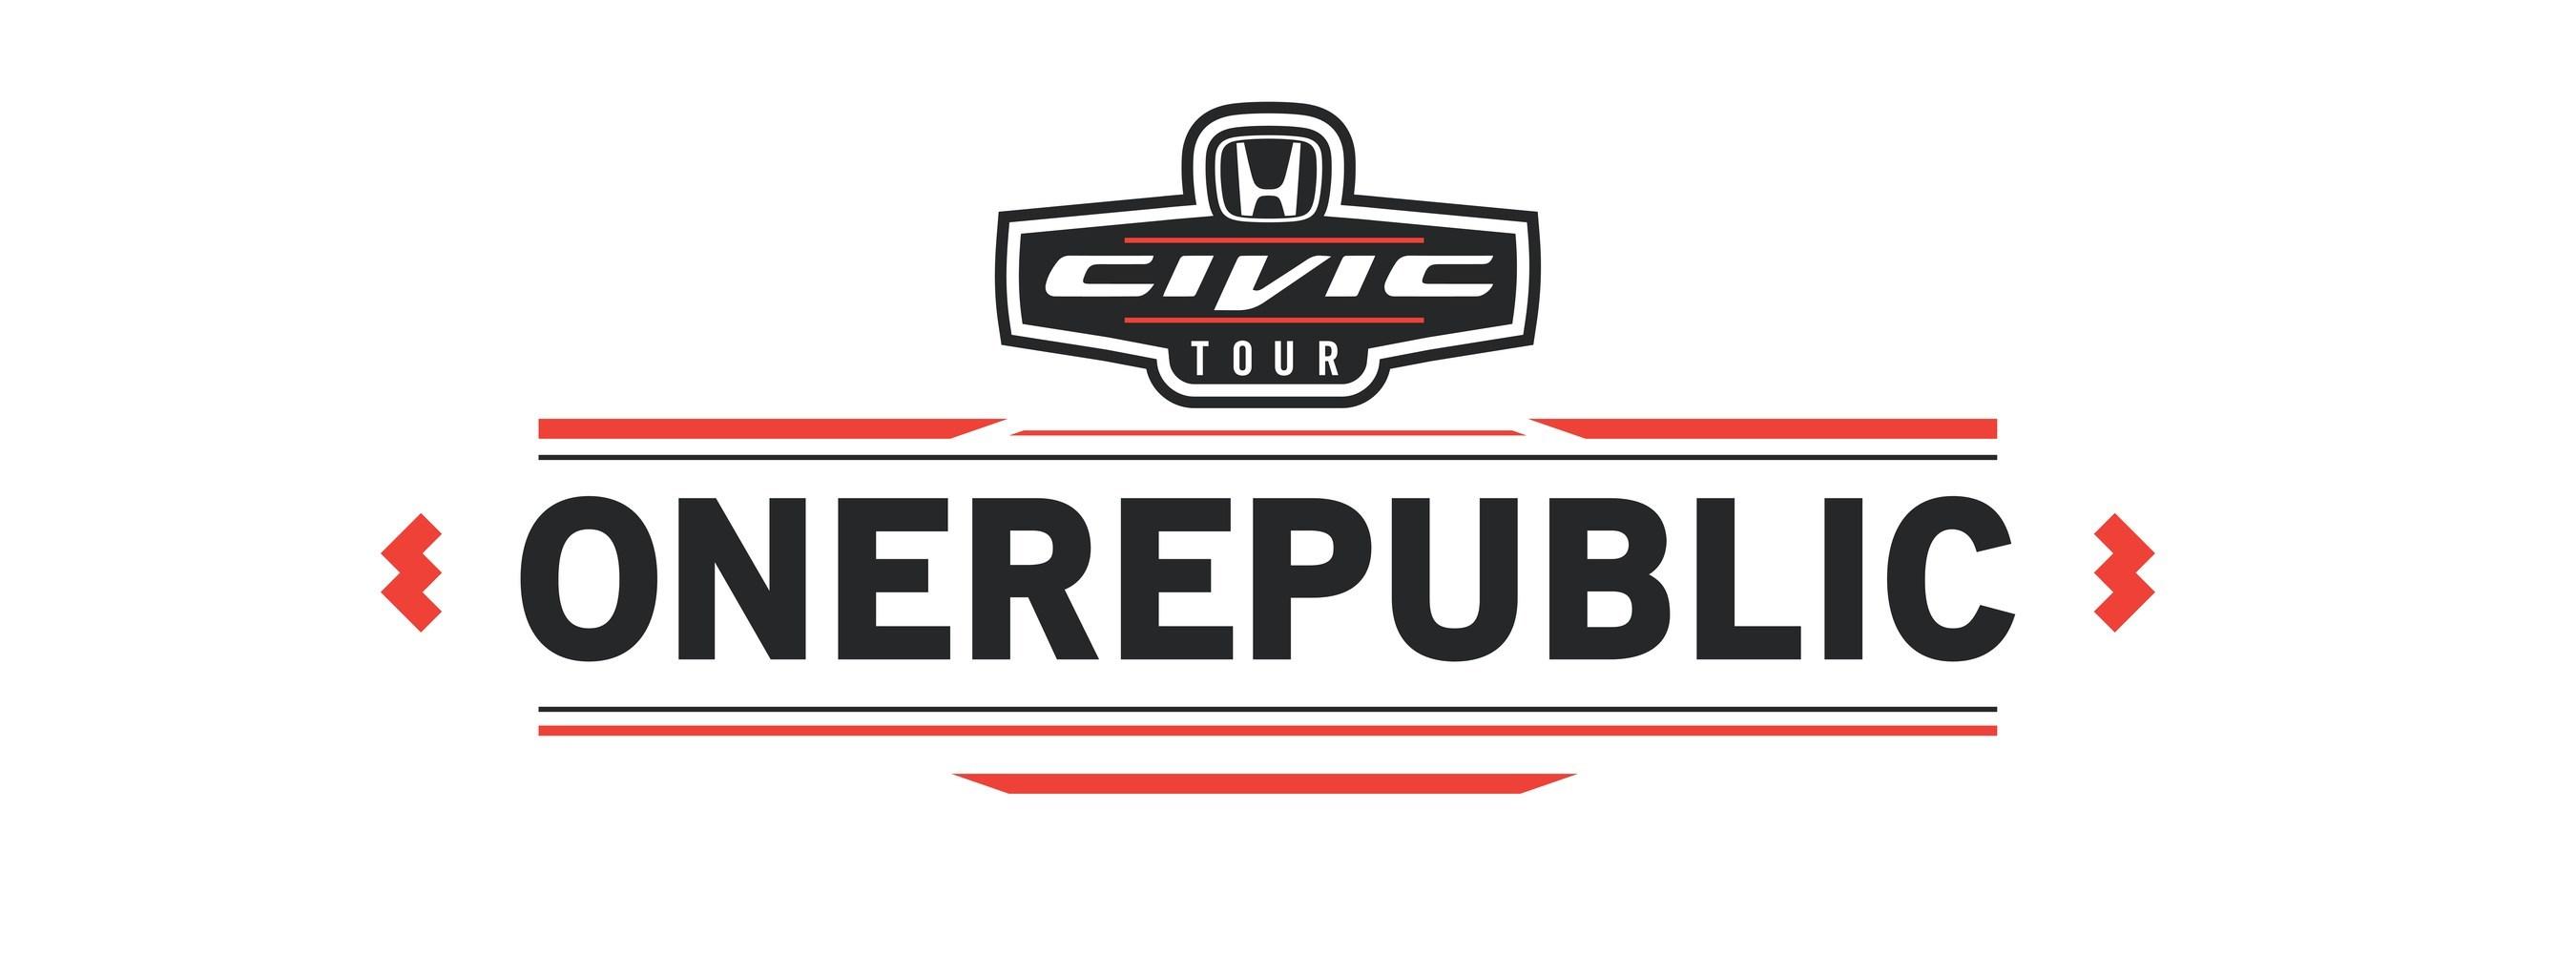 Onerepublic to headline 2017 honda civic tour for American honda motor co